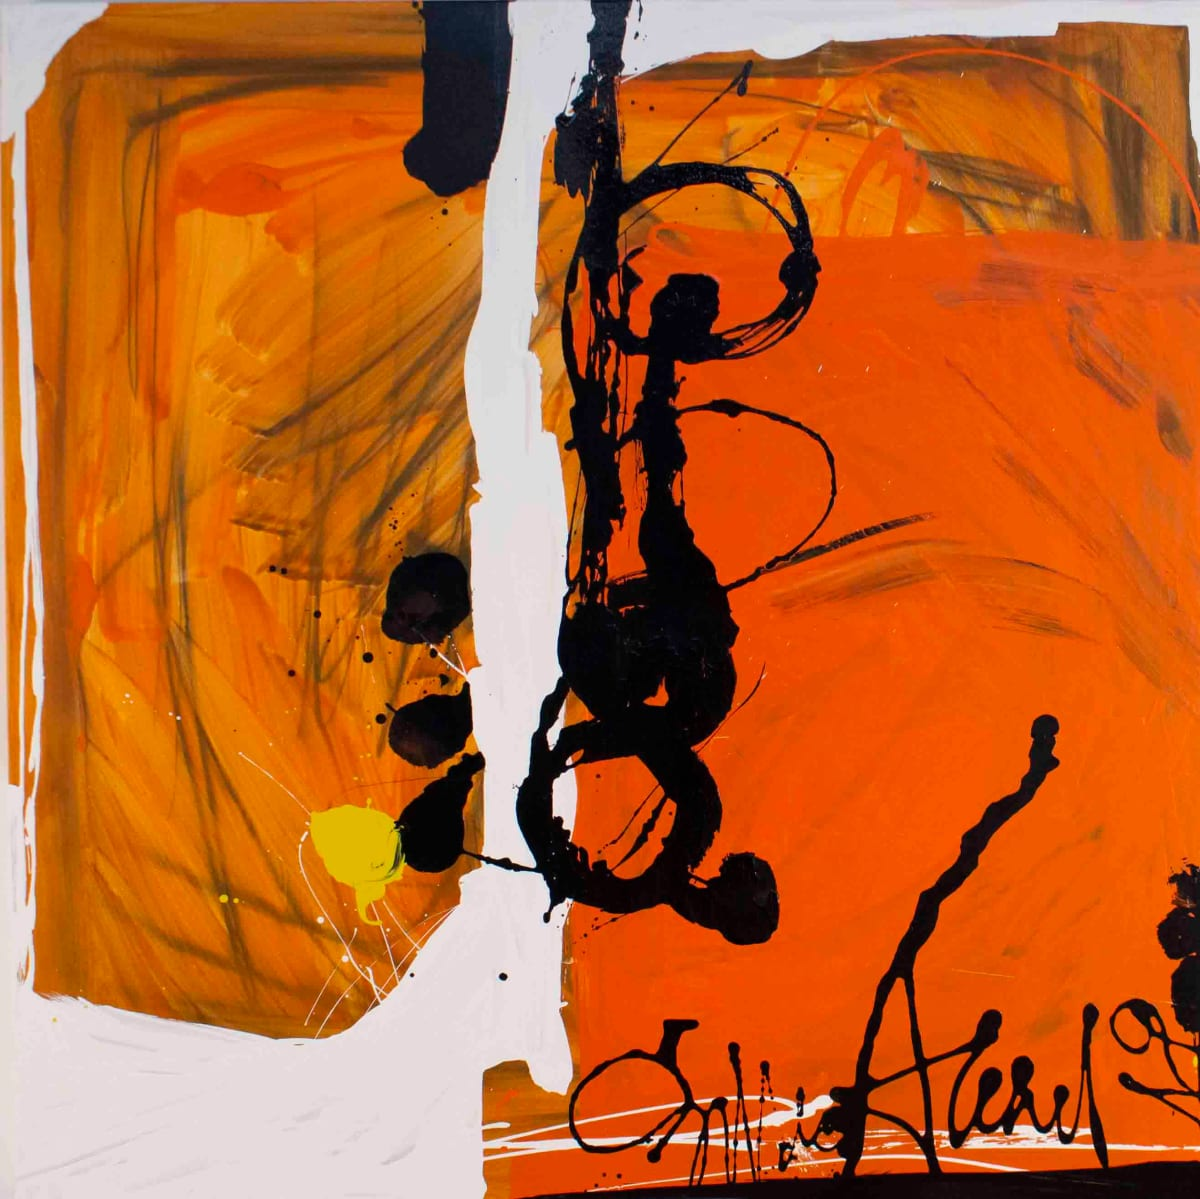 Serie 4x3 - Jorge SM